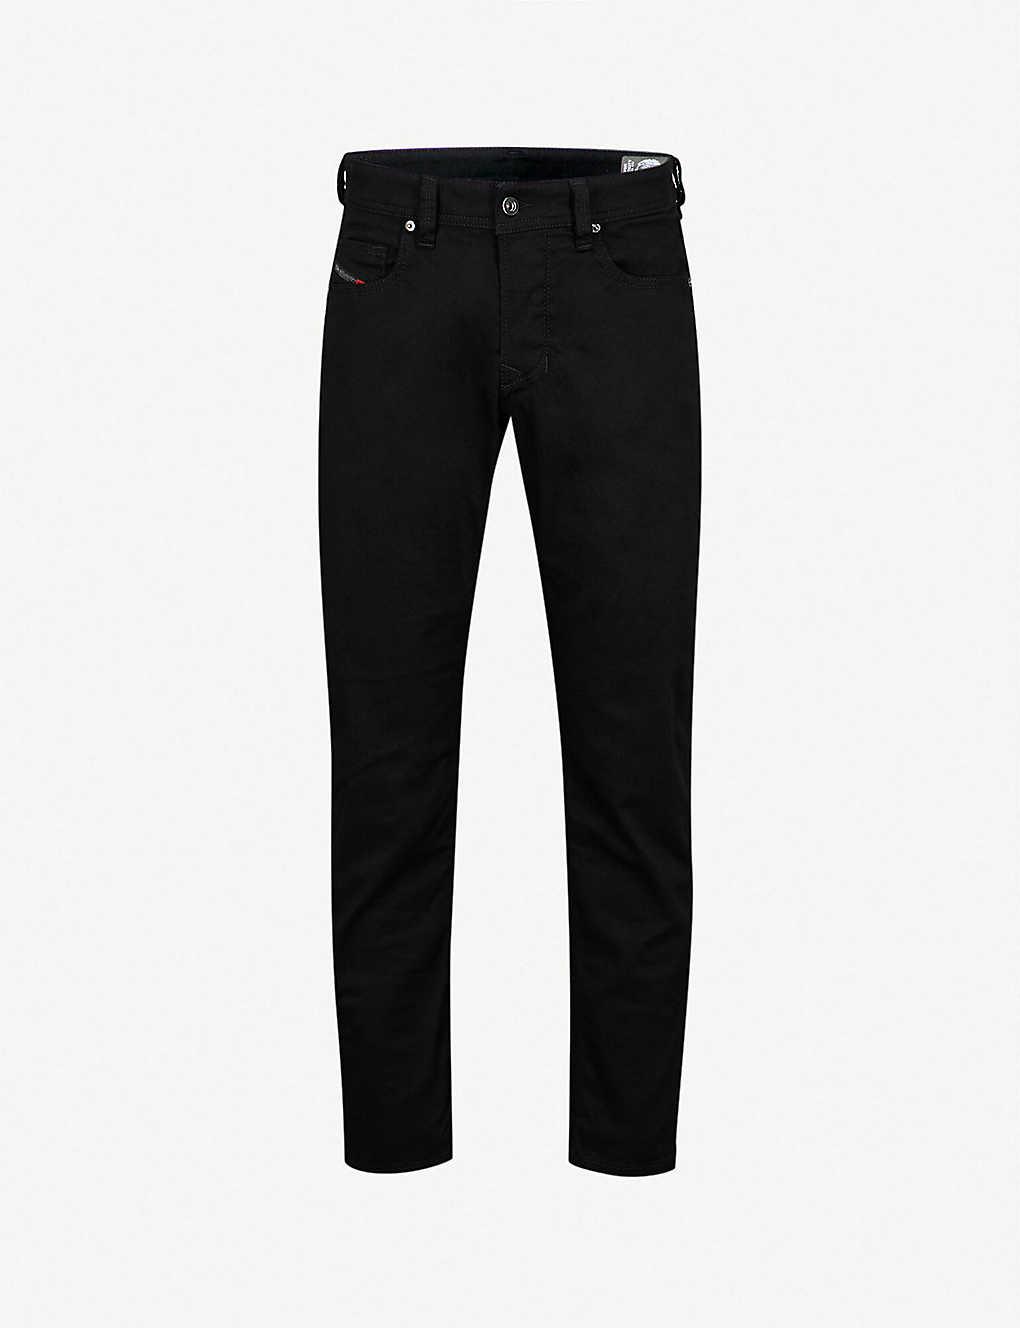 8310f753 DIESEL - Larkee-Beex regular-fit tapered jeans | Selfridges.com